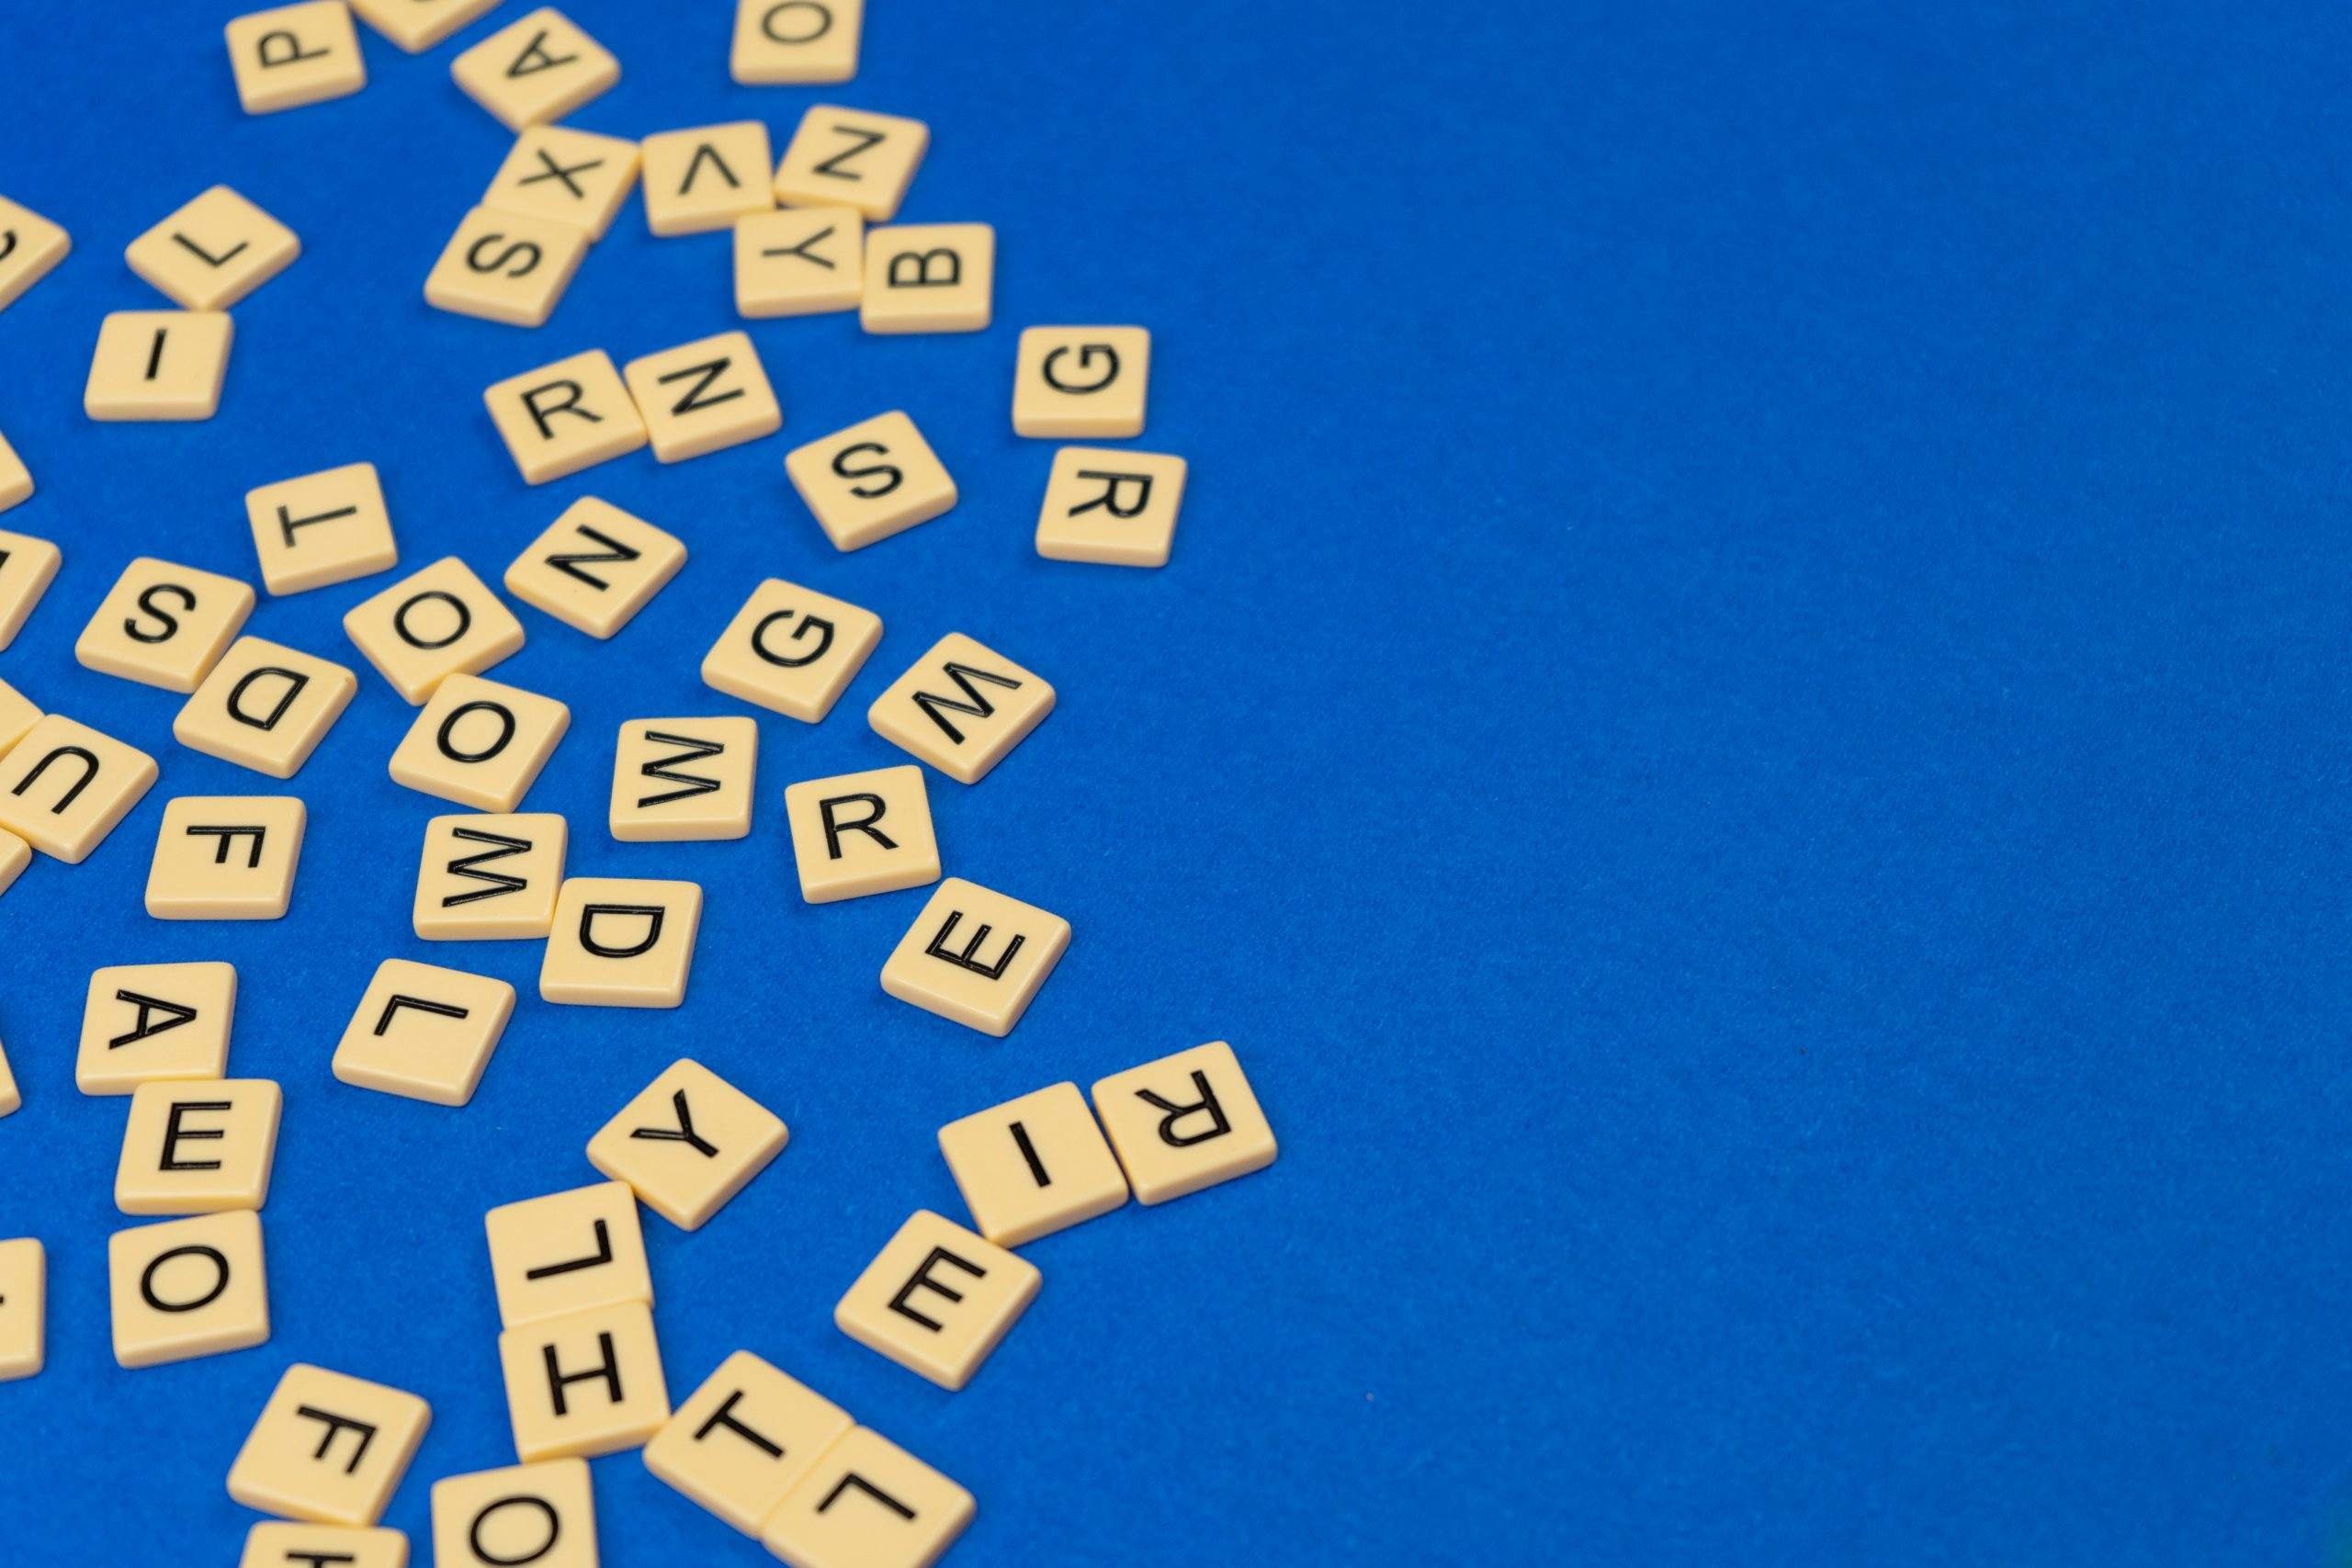 Scrabble top view